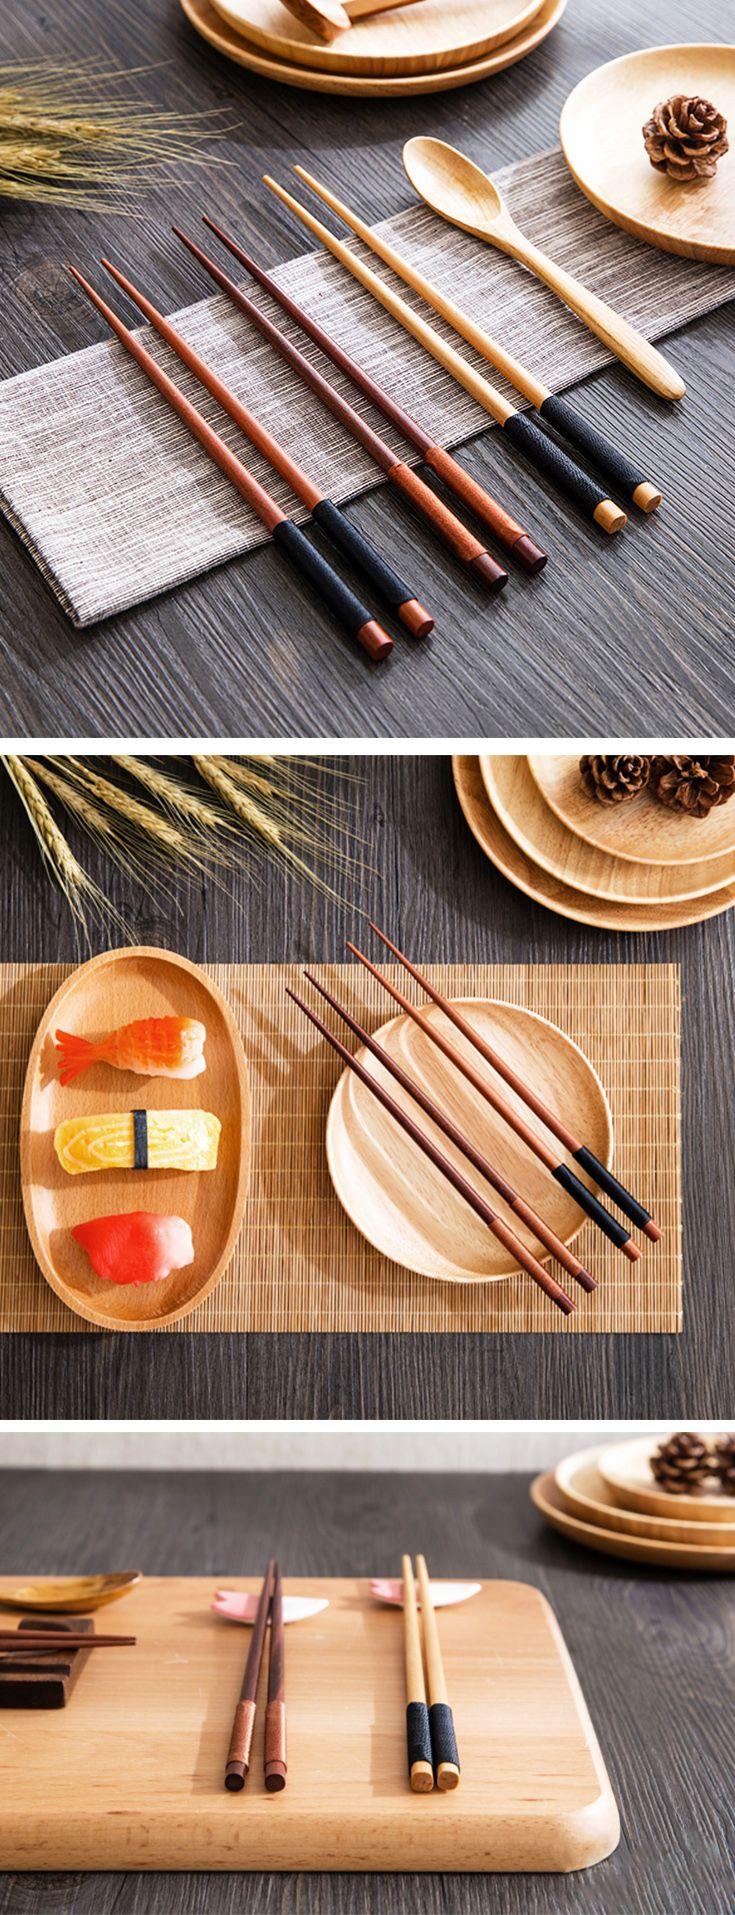 oishii wooden chopstick cutlery dining japanese minimalism dining kitchen organization on kitchen organization japanese id=91681